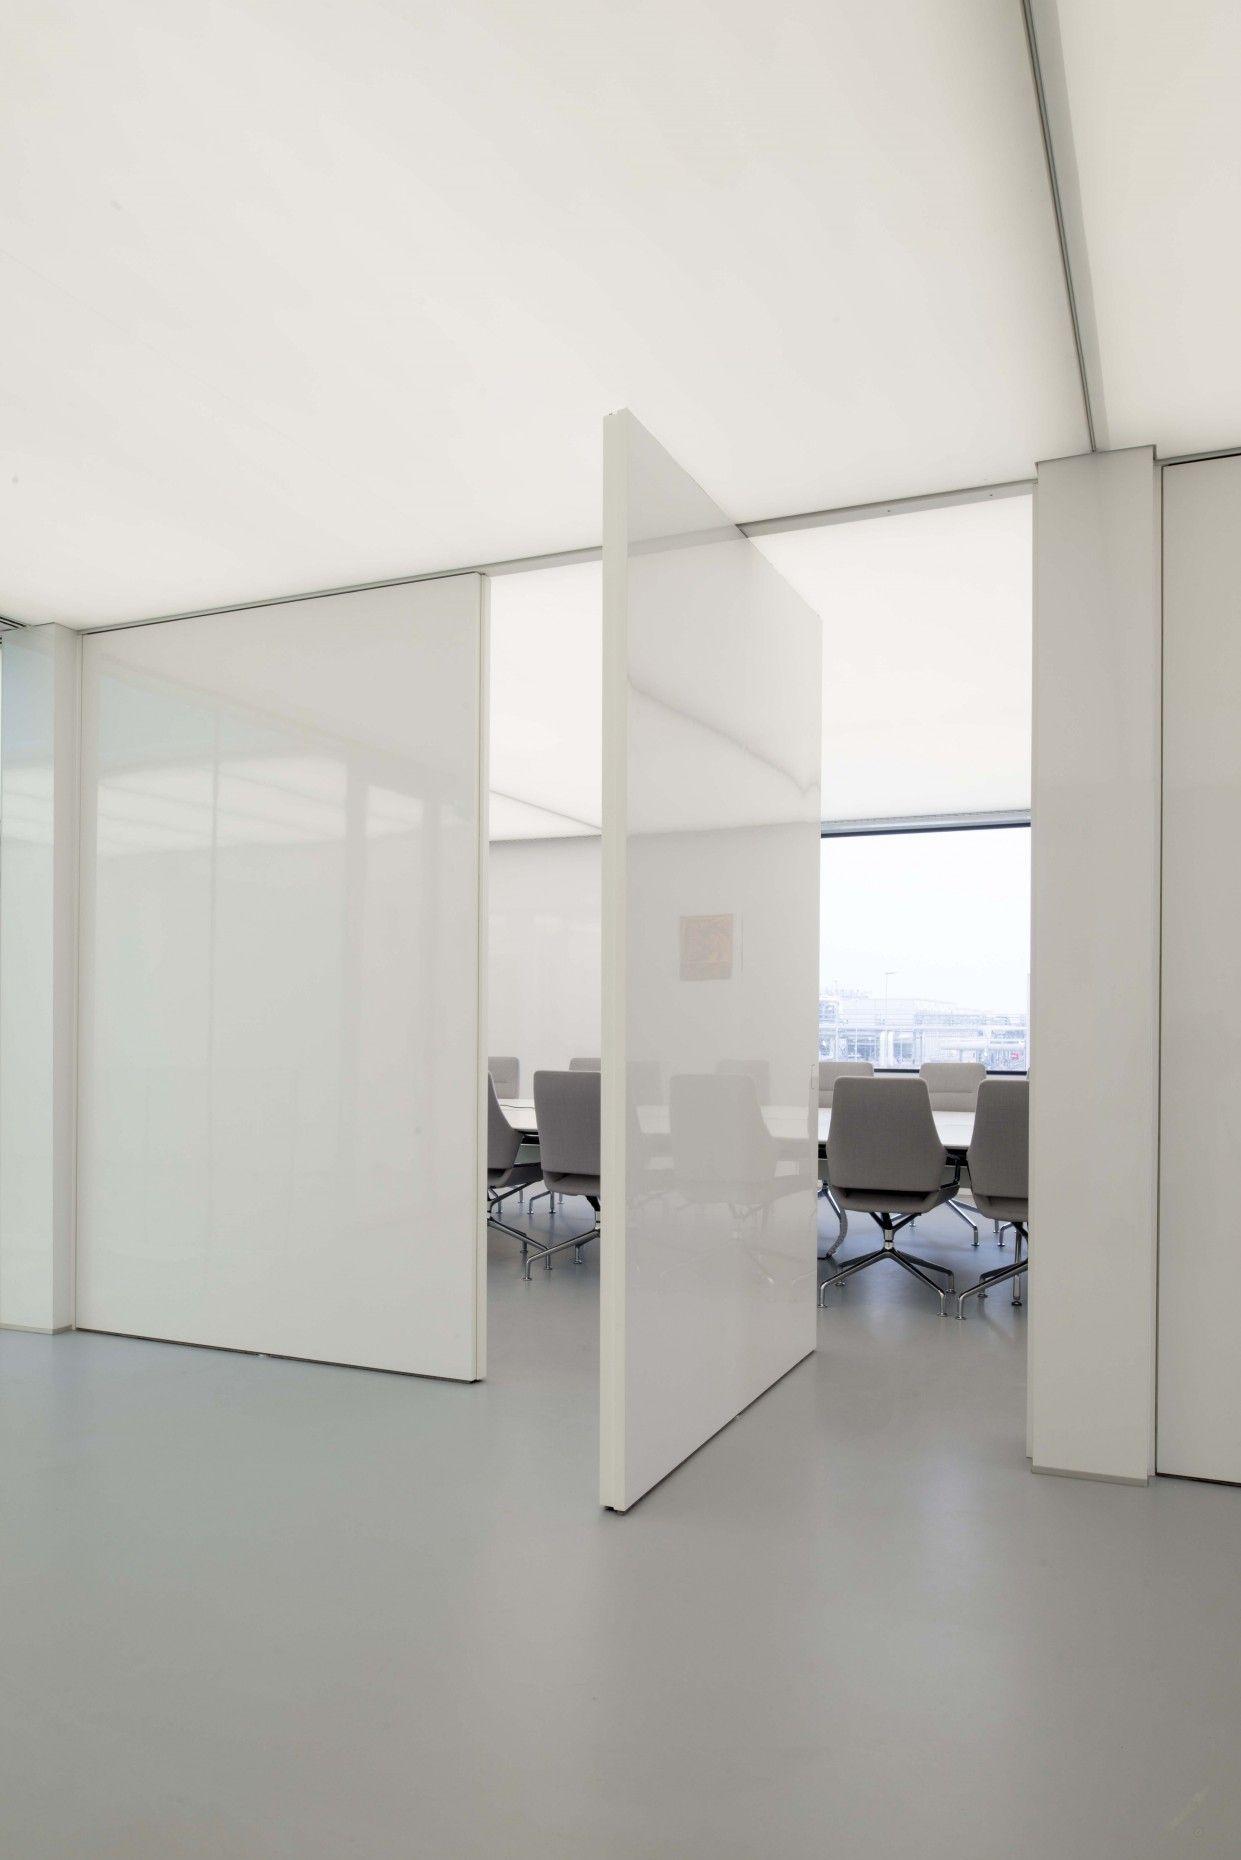 cloison amovible pivotante cloison amovible en aluminium. Black Bedroom Furniture Sets. Home Design Ideas